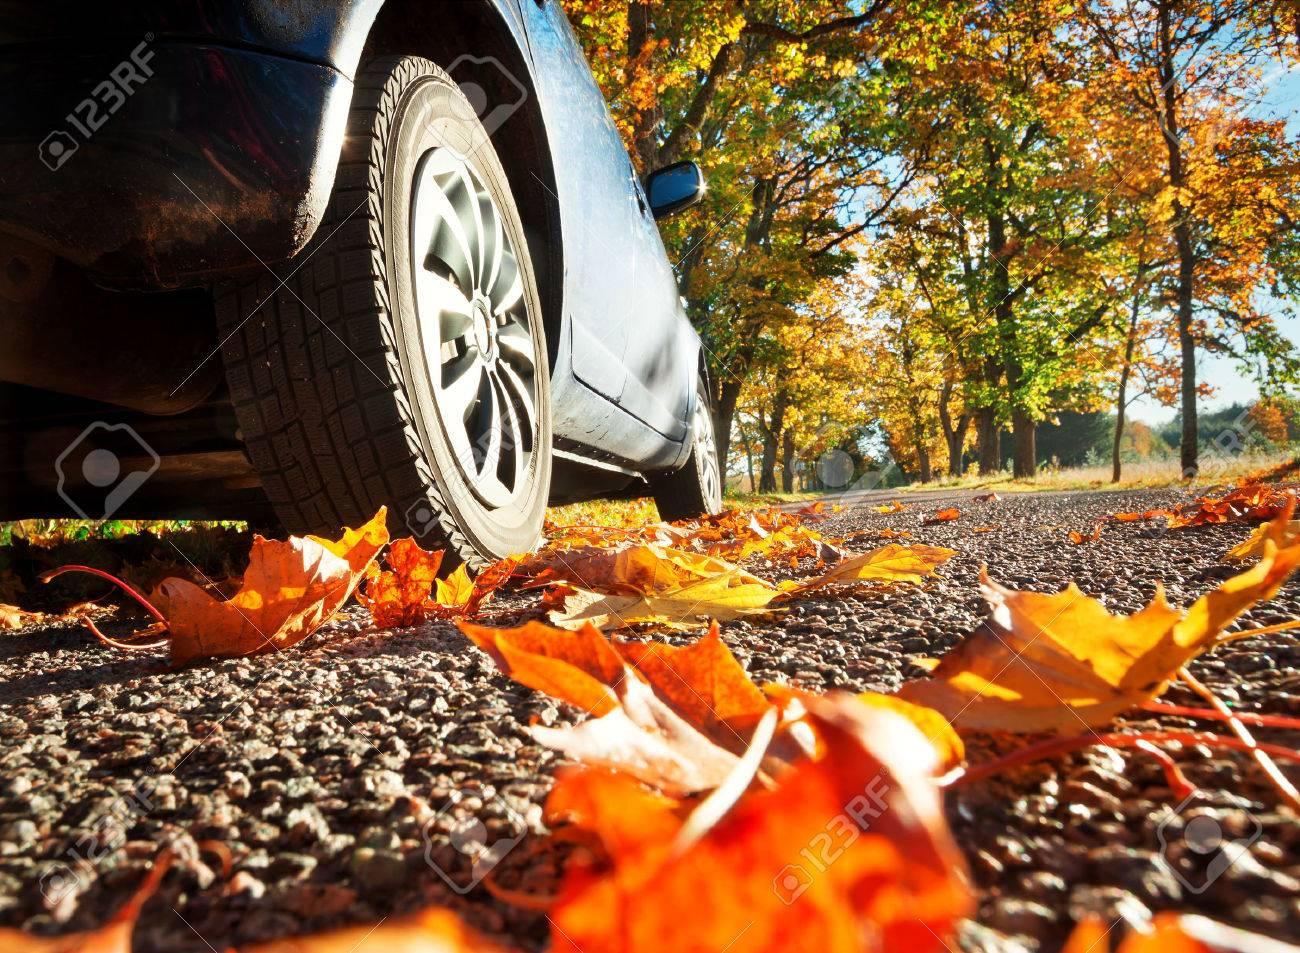 Car on asphalt road on autumnr day at park - 63437089